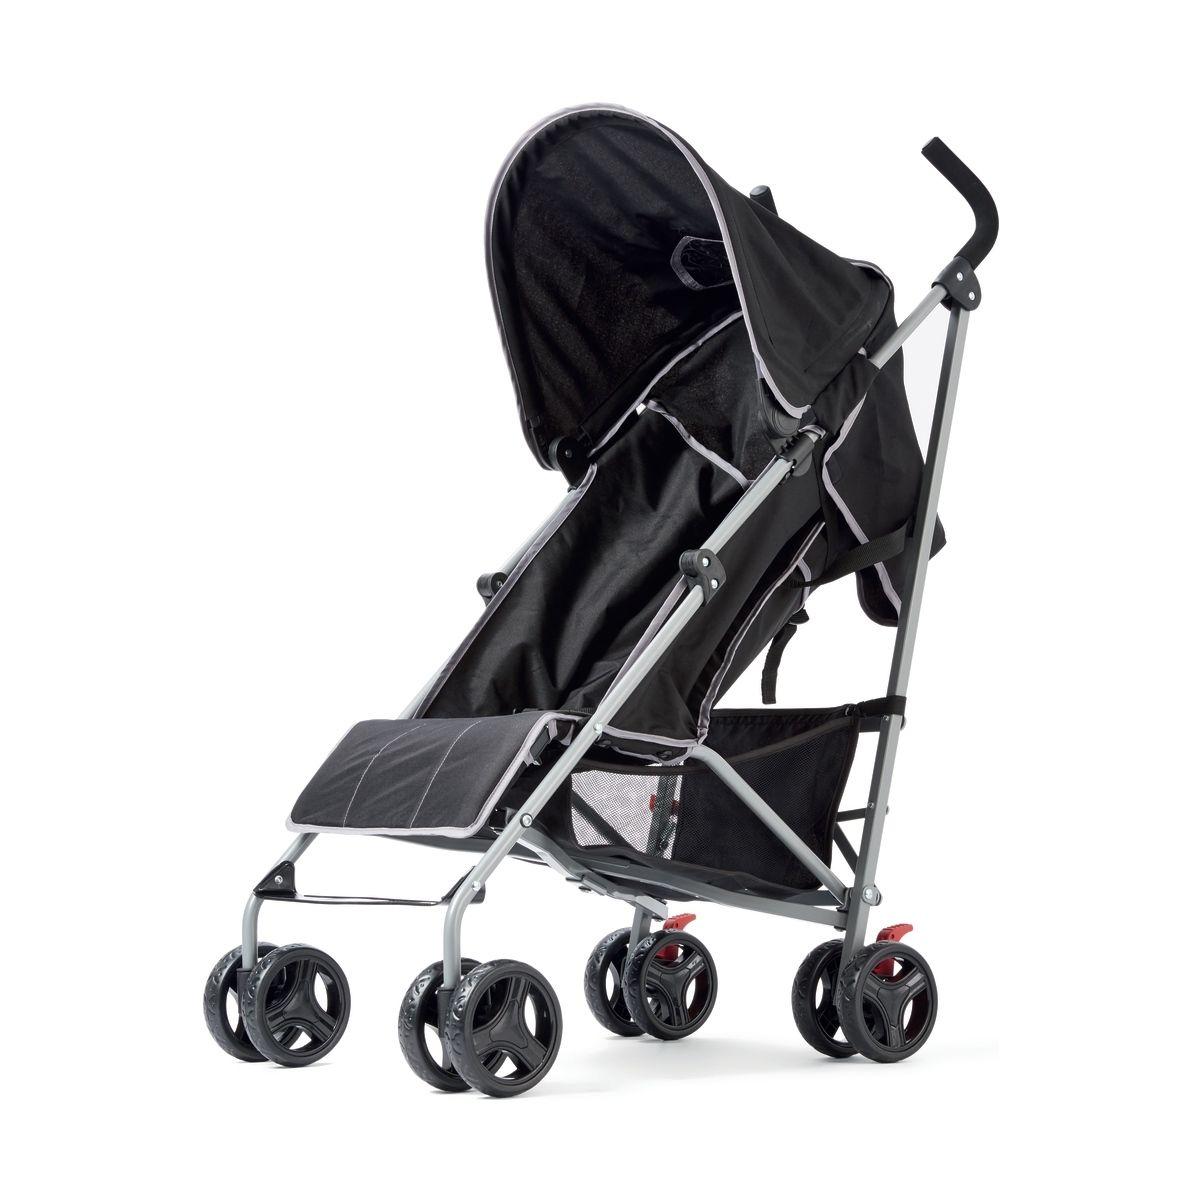 Layback Umbrella Stroller Kmart Umbrella Stroller Stroller